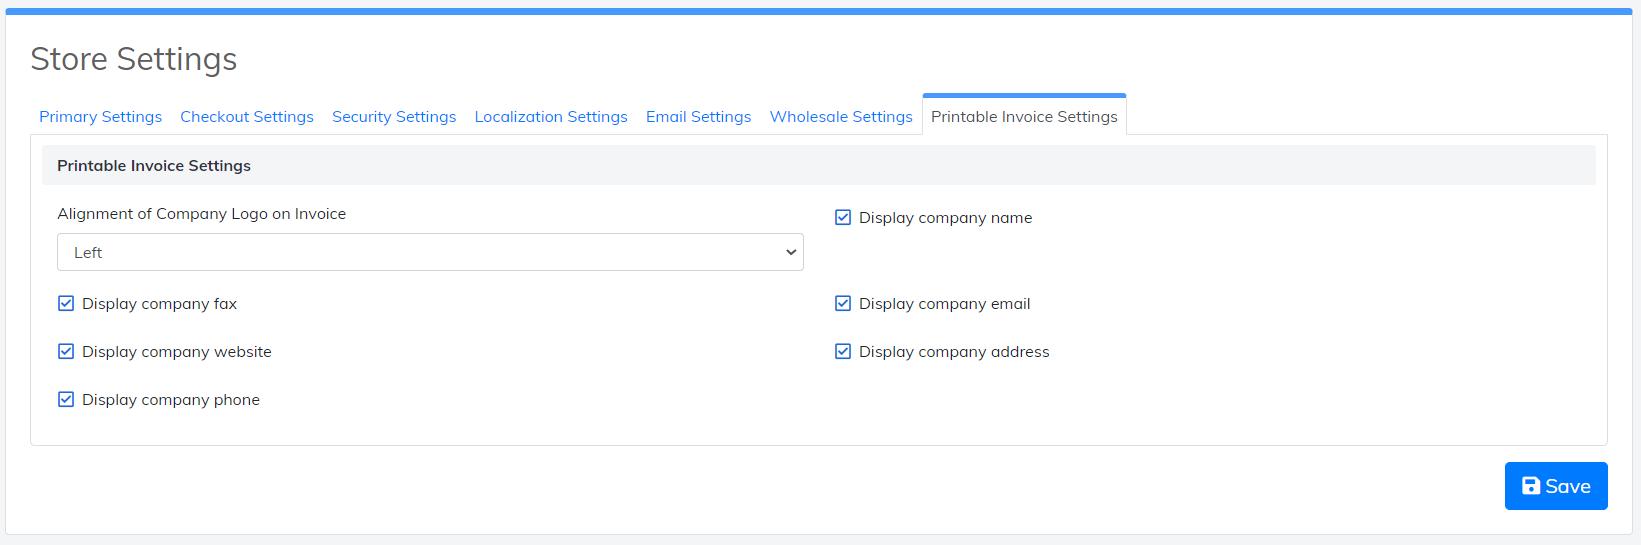 printable invoice settings